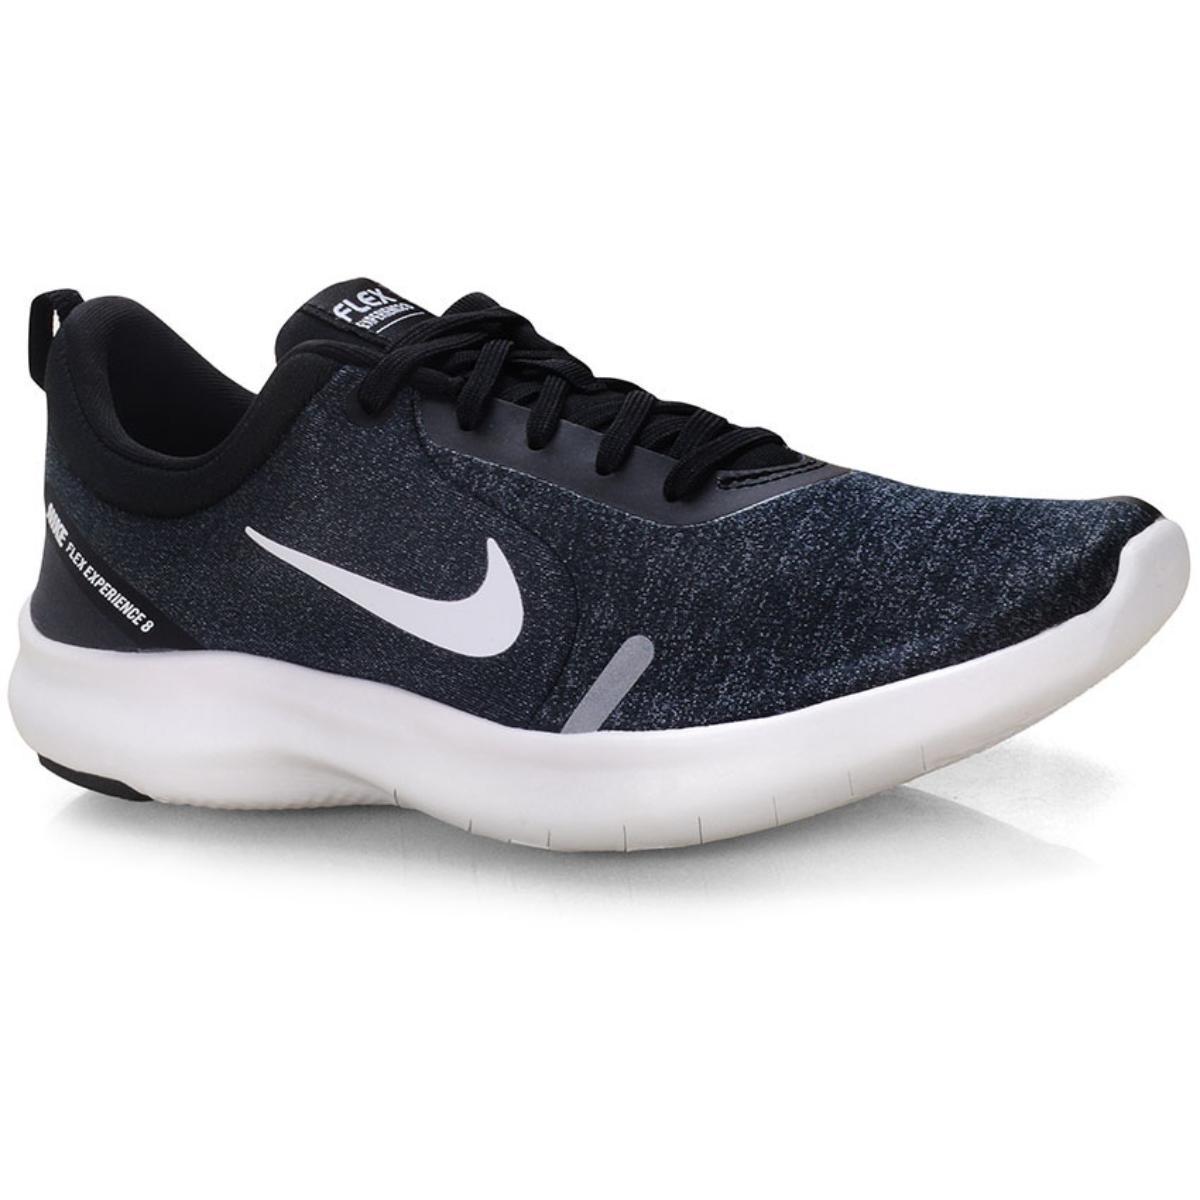 Tênis Feminino Nike Aj5908-013 Flex Experience rn 8 Preto/branco